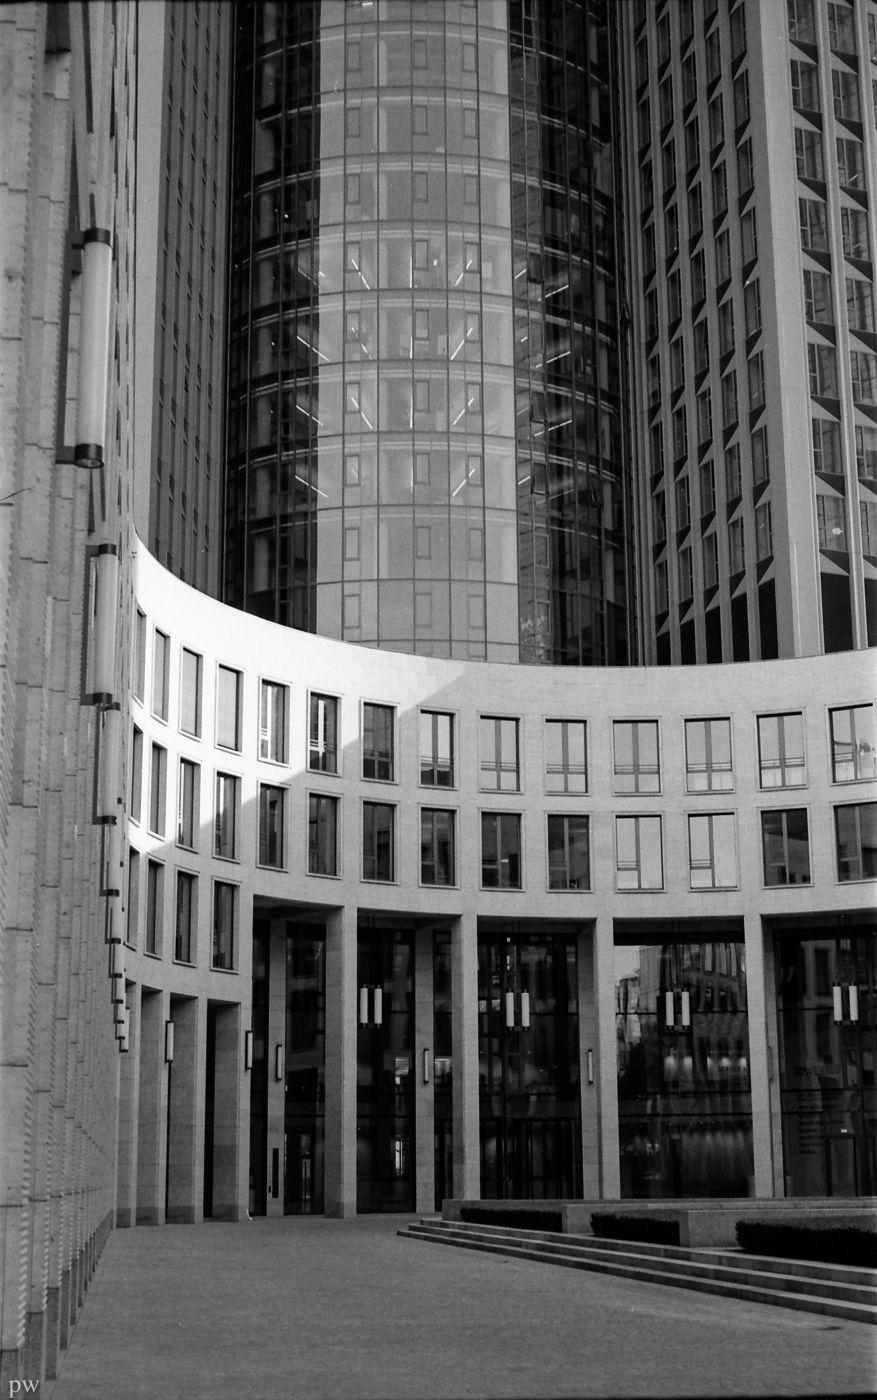 Tower 185, Frankfurt am Main, Germany